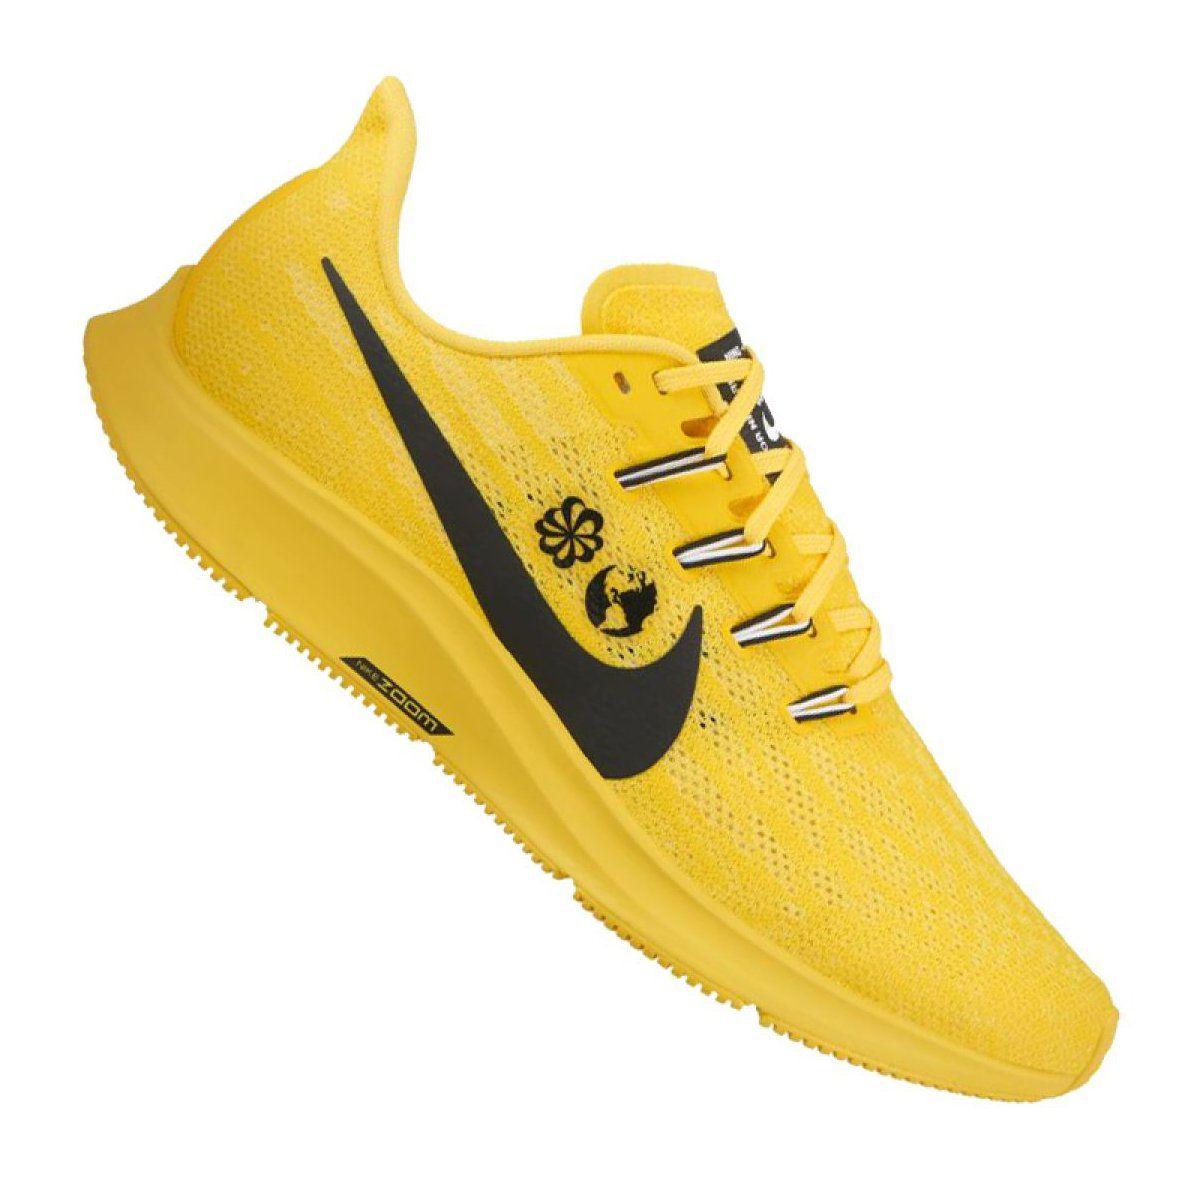 Buty Biegowe Nike Air Zoom Pegasus 36 Cody M Ci1723 700 Zolte Nike Air Nike Air Zoom Pegasus Nike